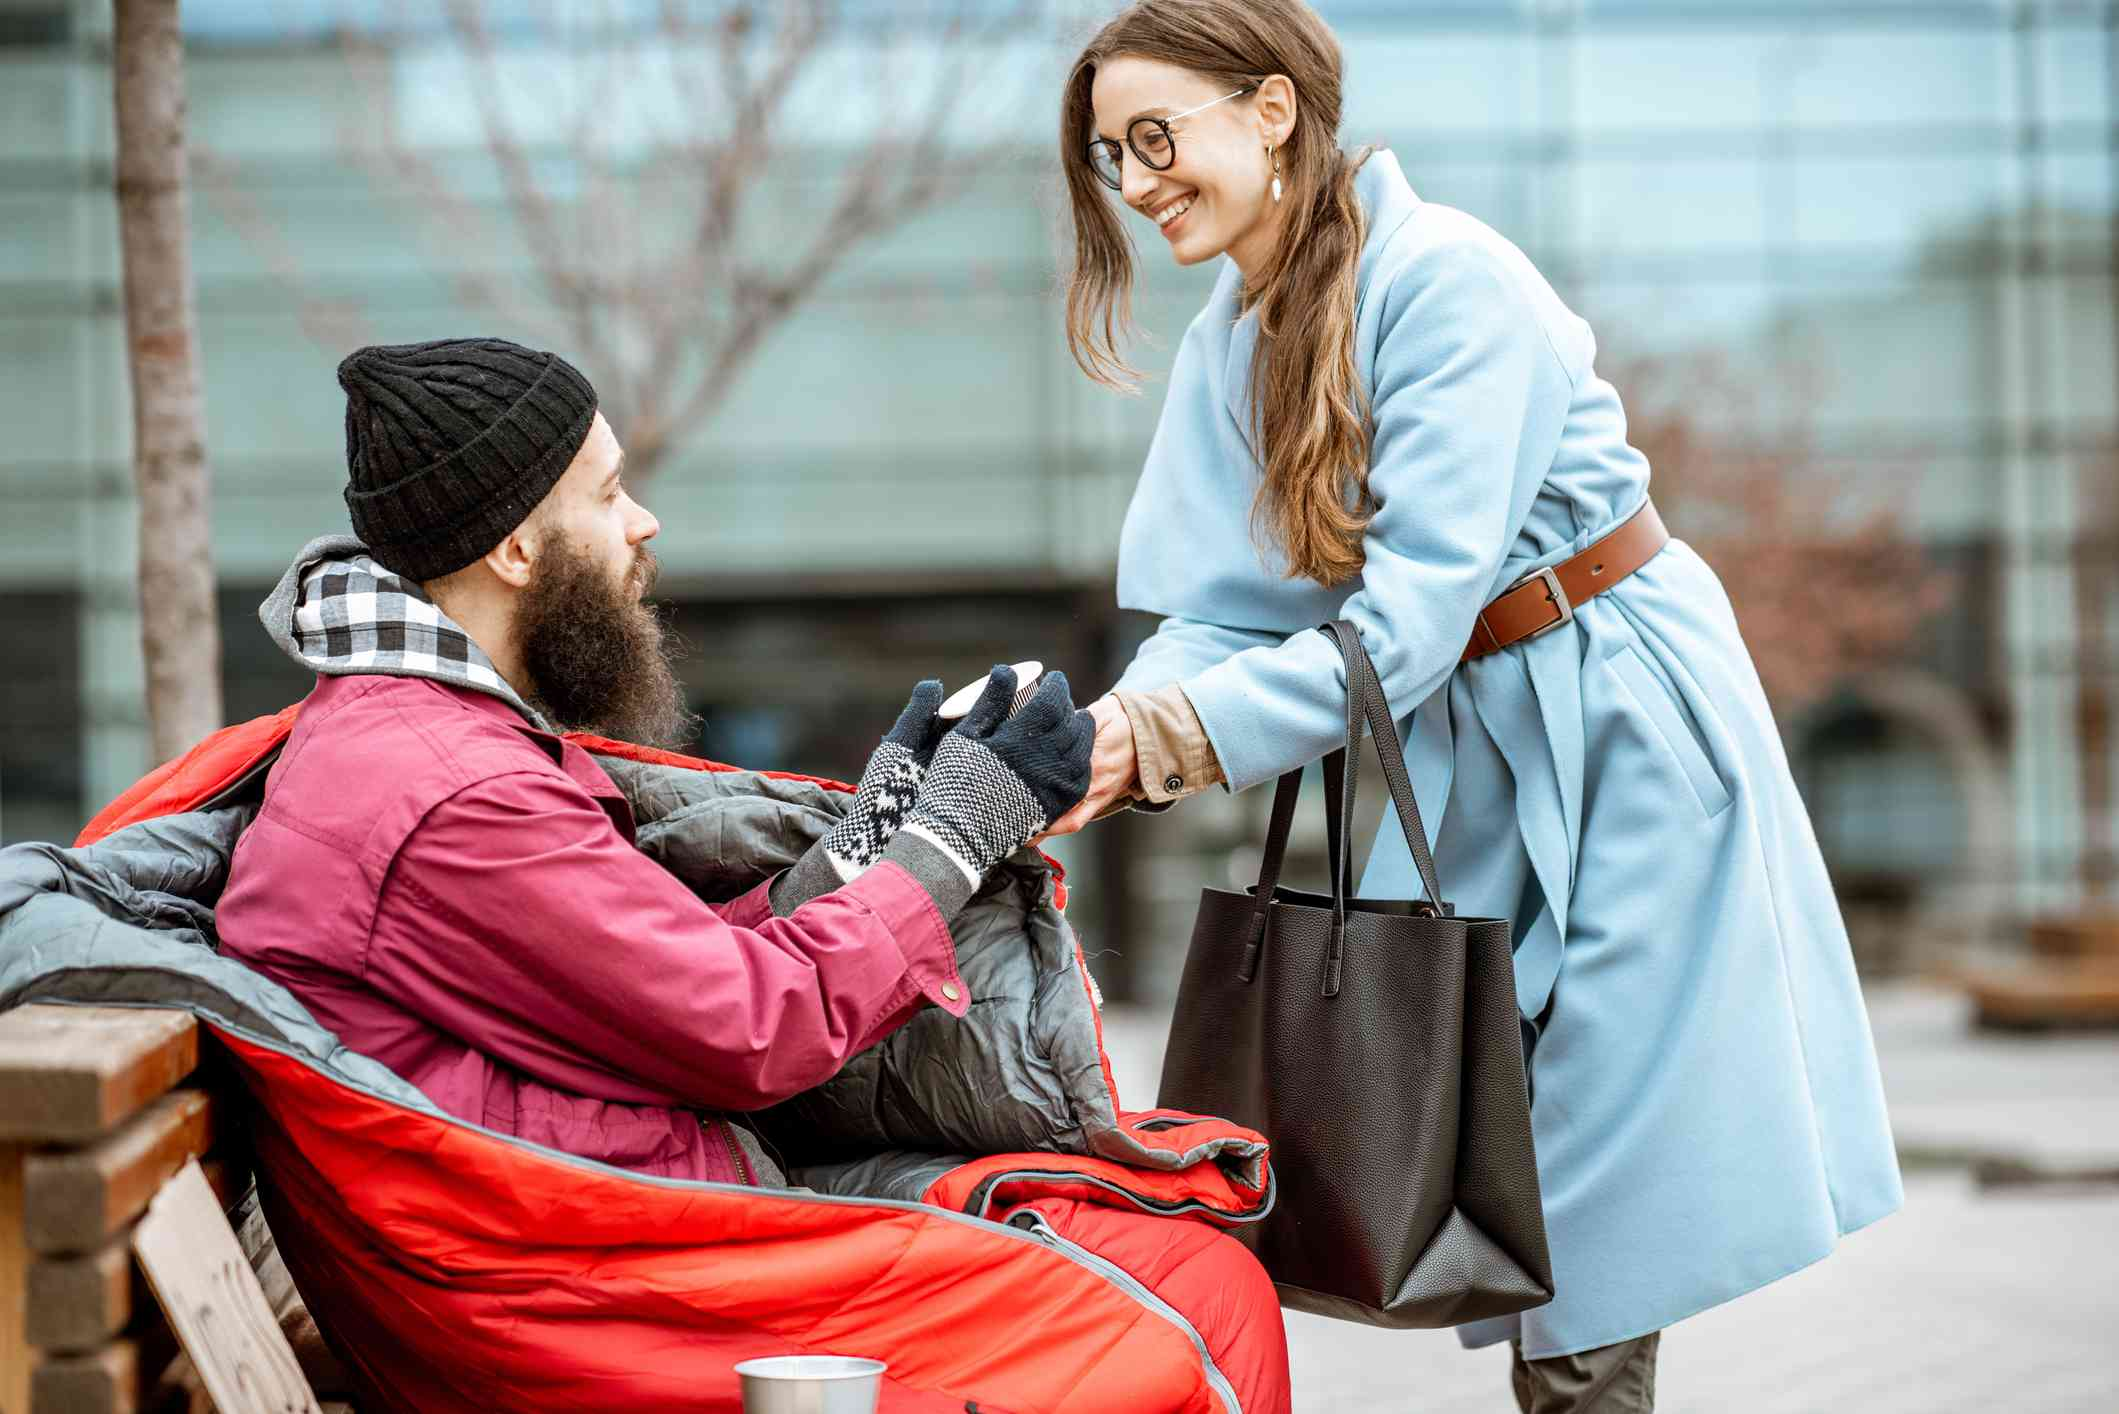 woman giving coffee to homeless man